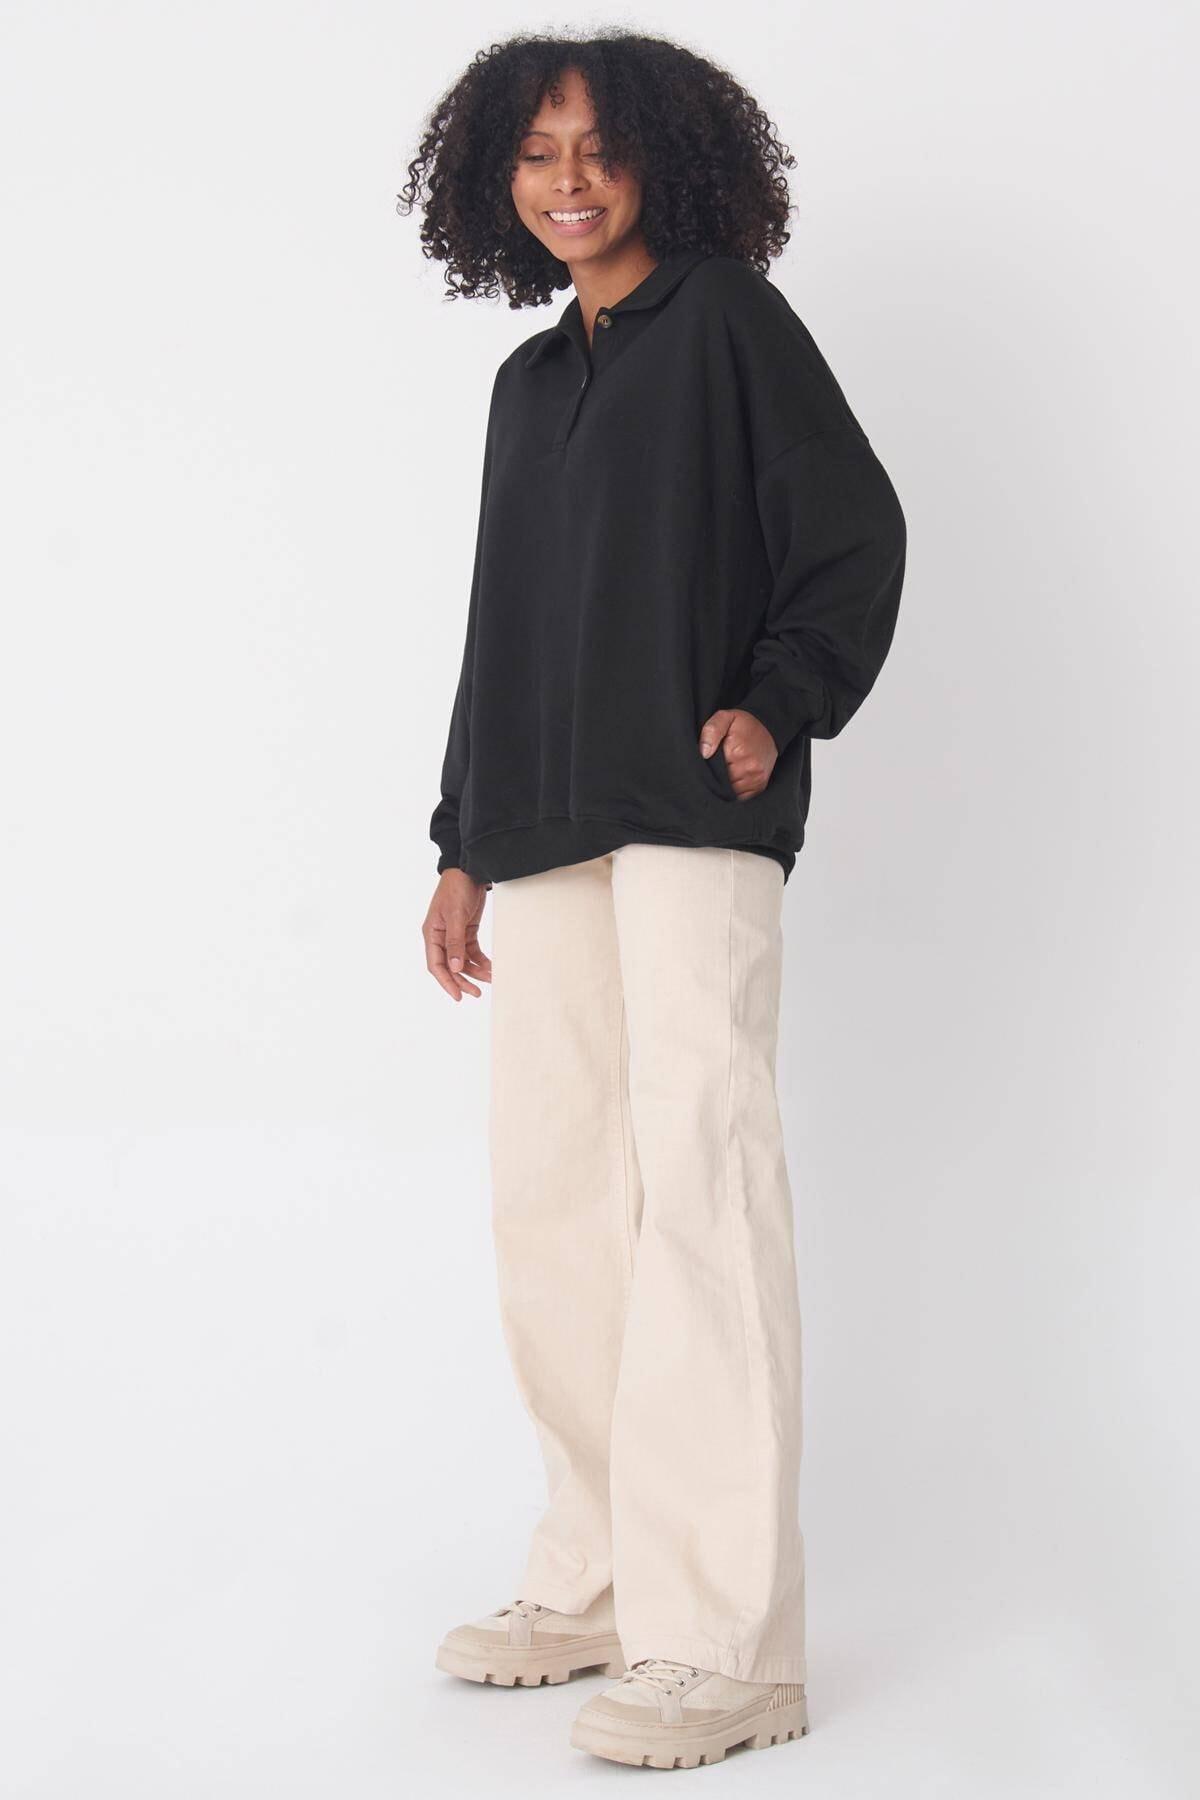 Addax Kadın Siyah Gömlek Yaka Sweat S0703 - C13 2